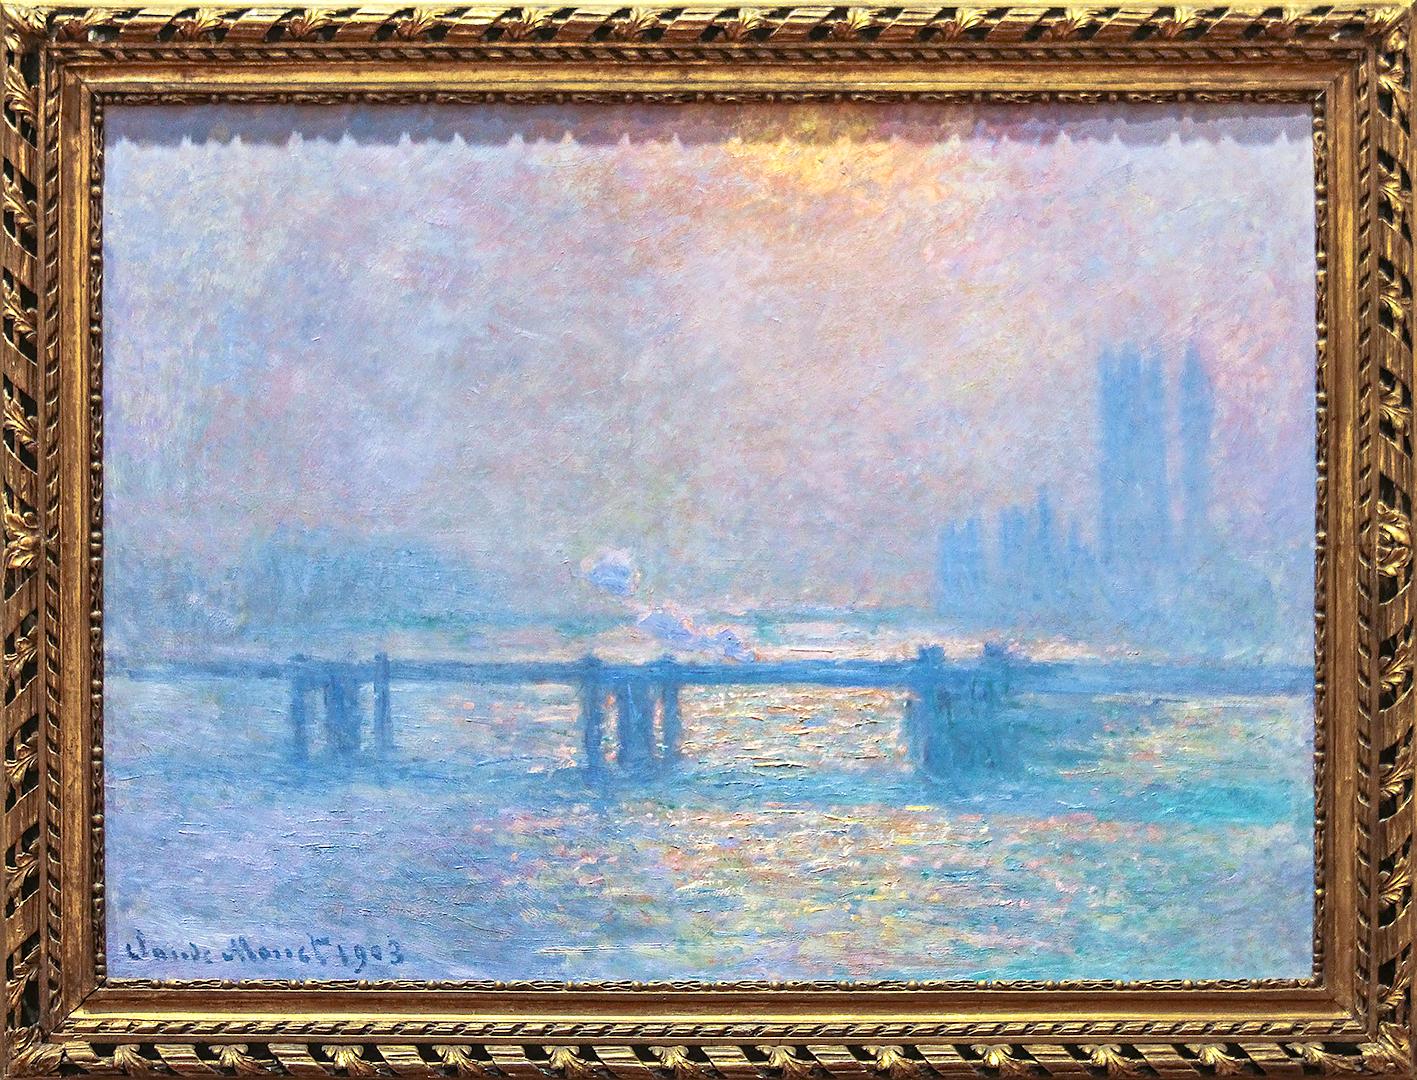 Charing Cross Bridge 1903 by Monet